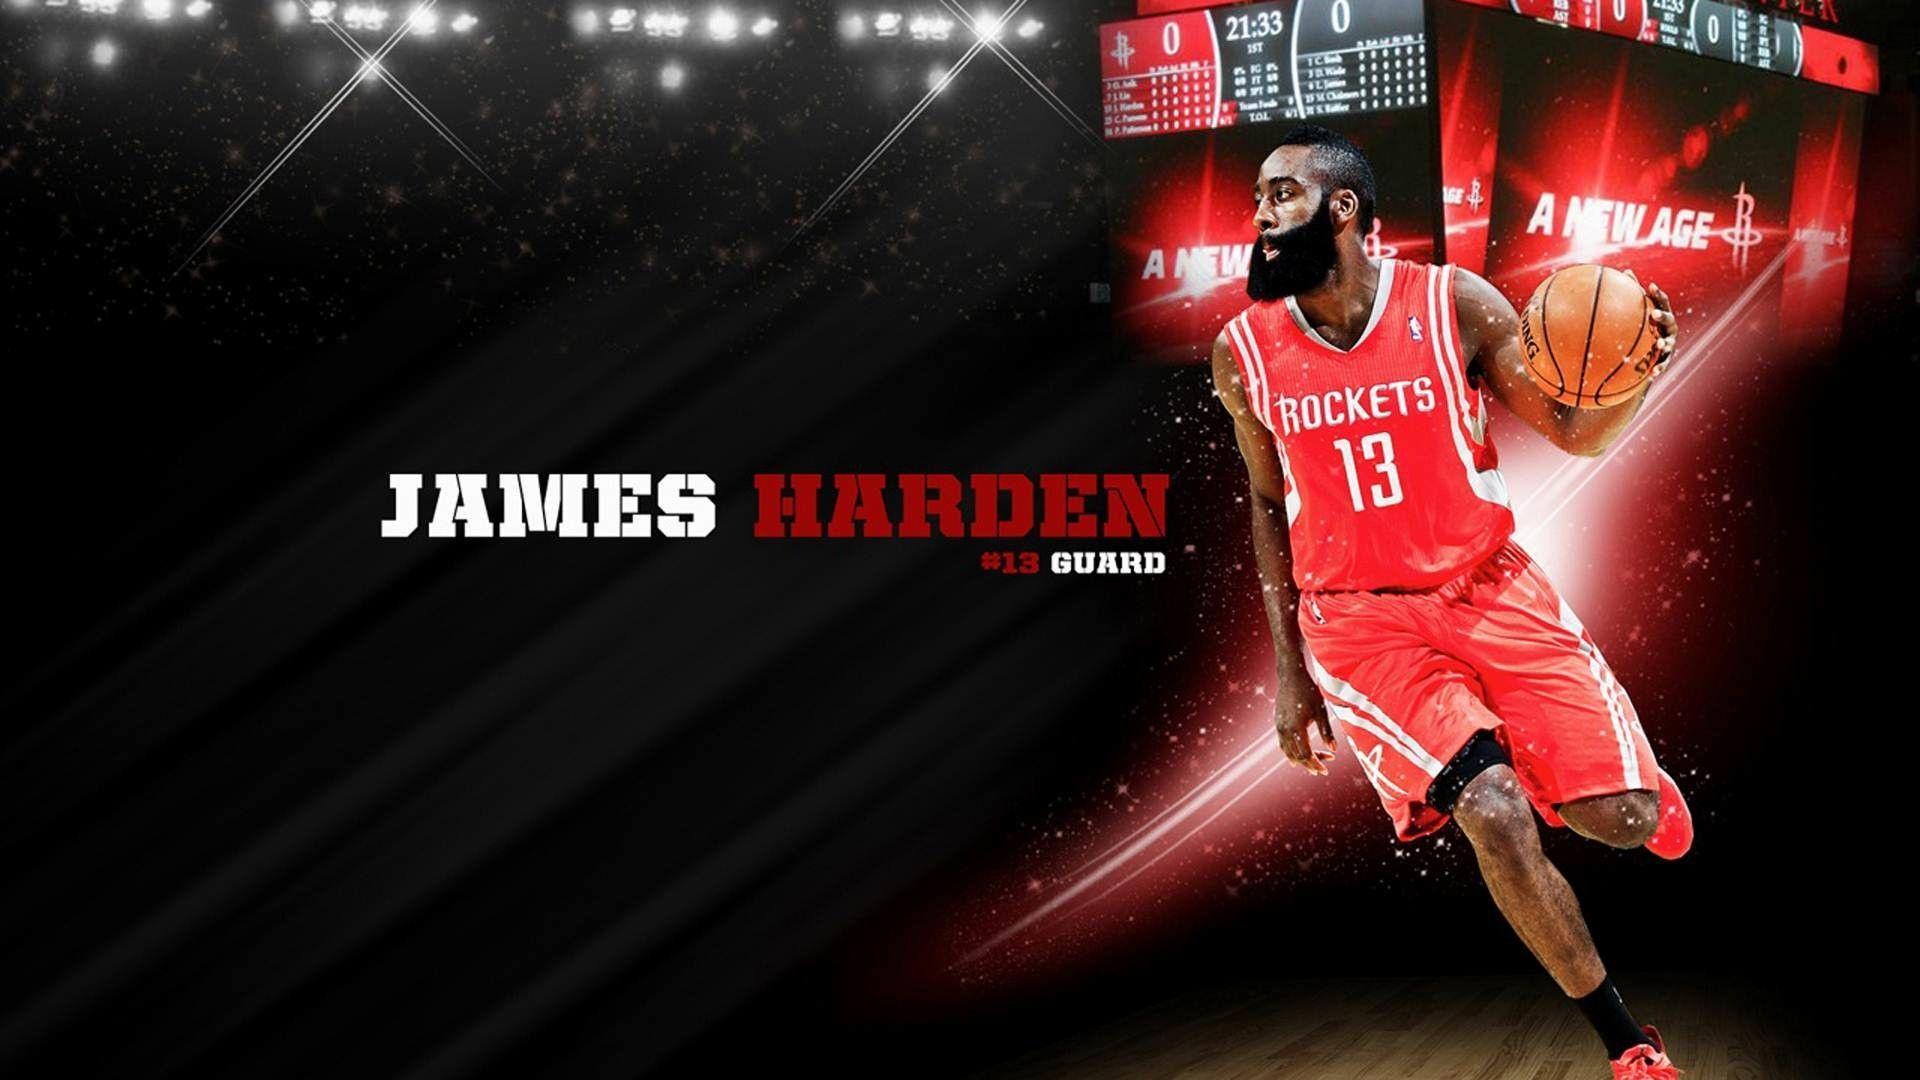 Houston rockets james harden wallpapers wallpaper cave - James harden iphone wallpaper ...